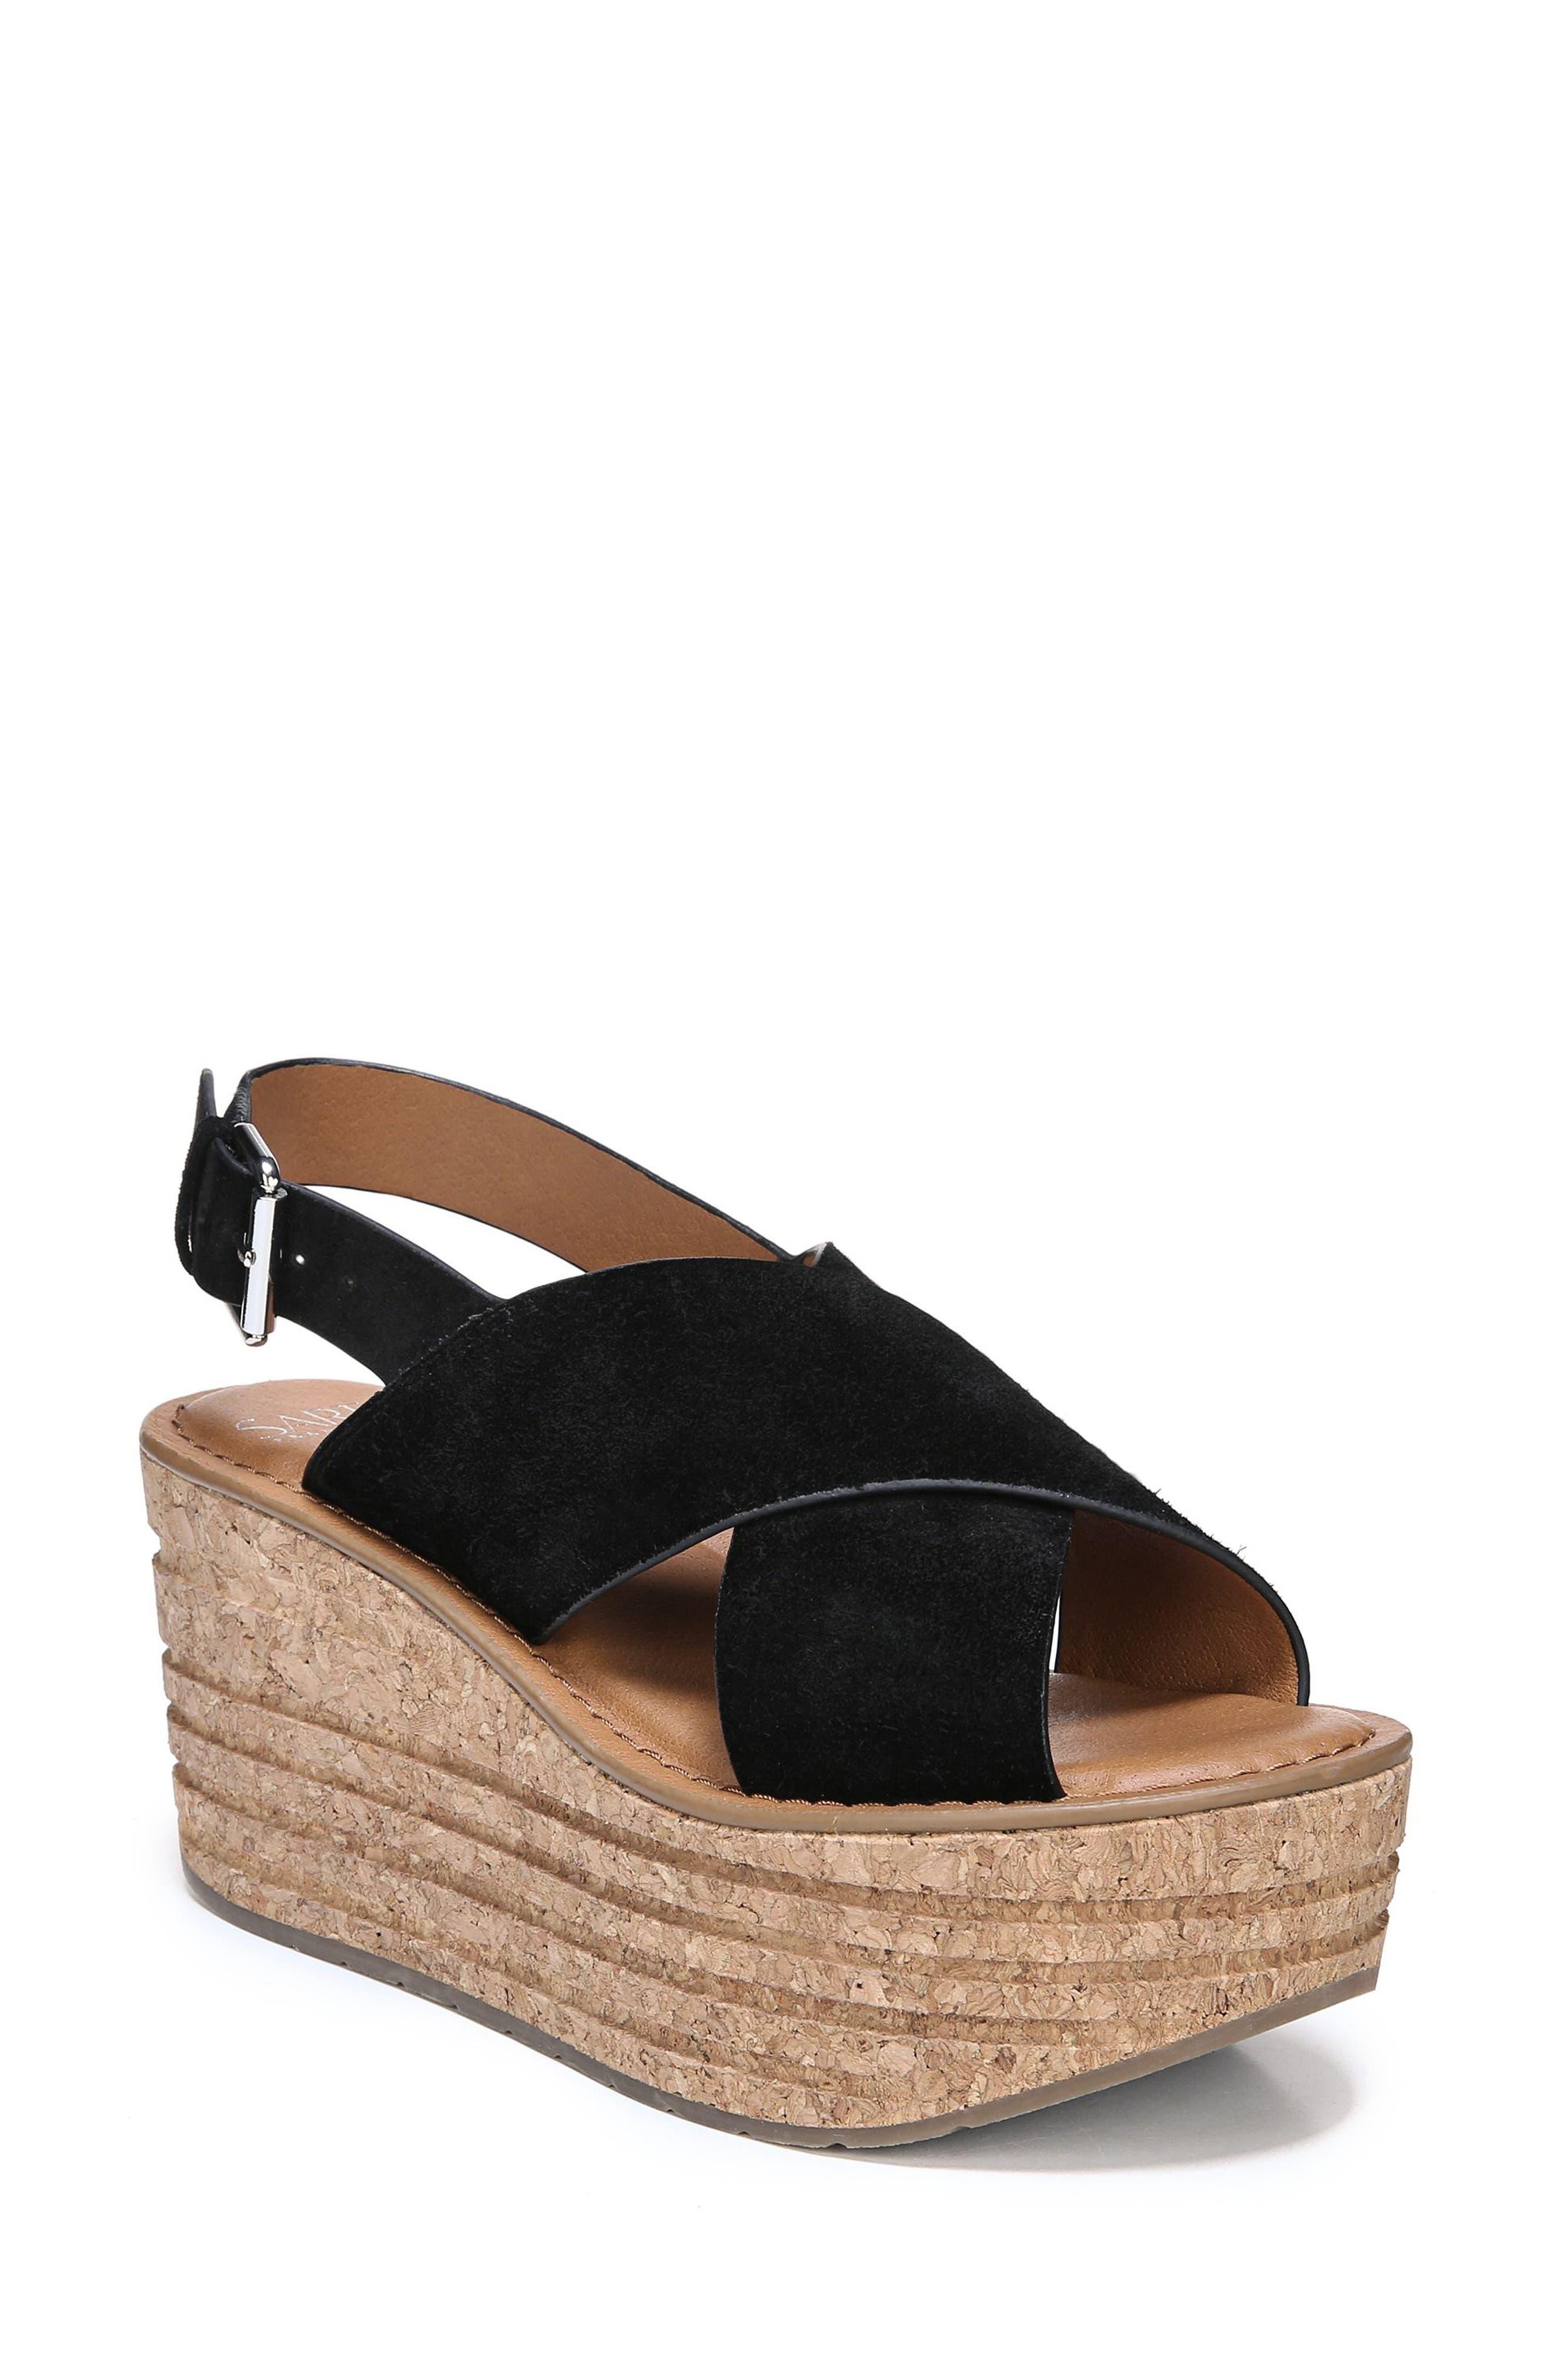 Caroline Platform Wedge Sandal,                             Main thumbnail 1, color,                             001